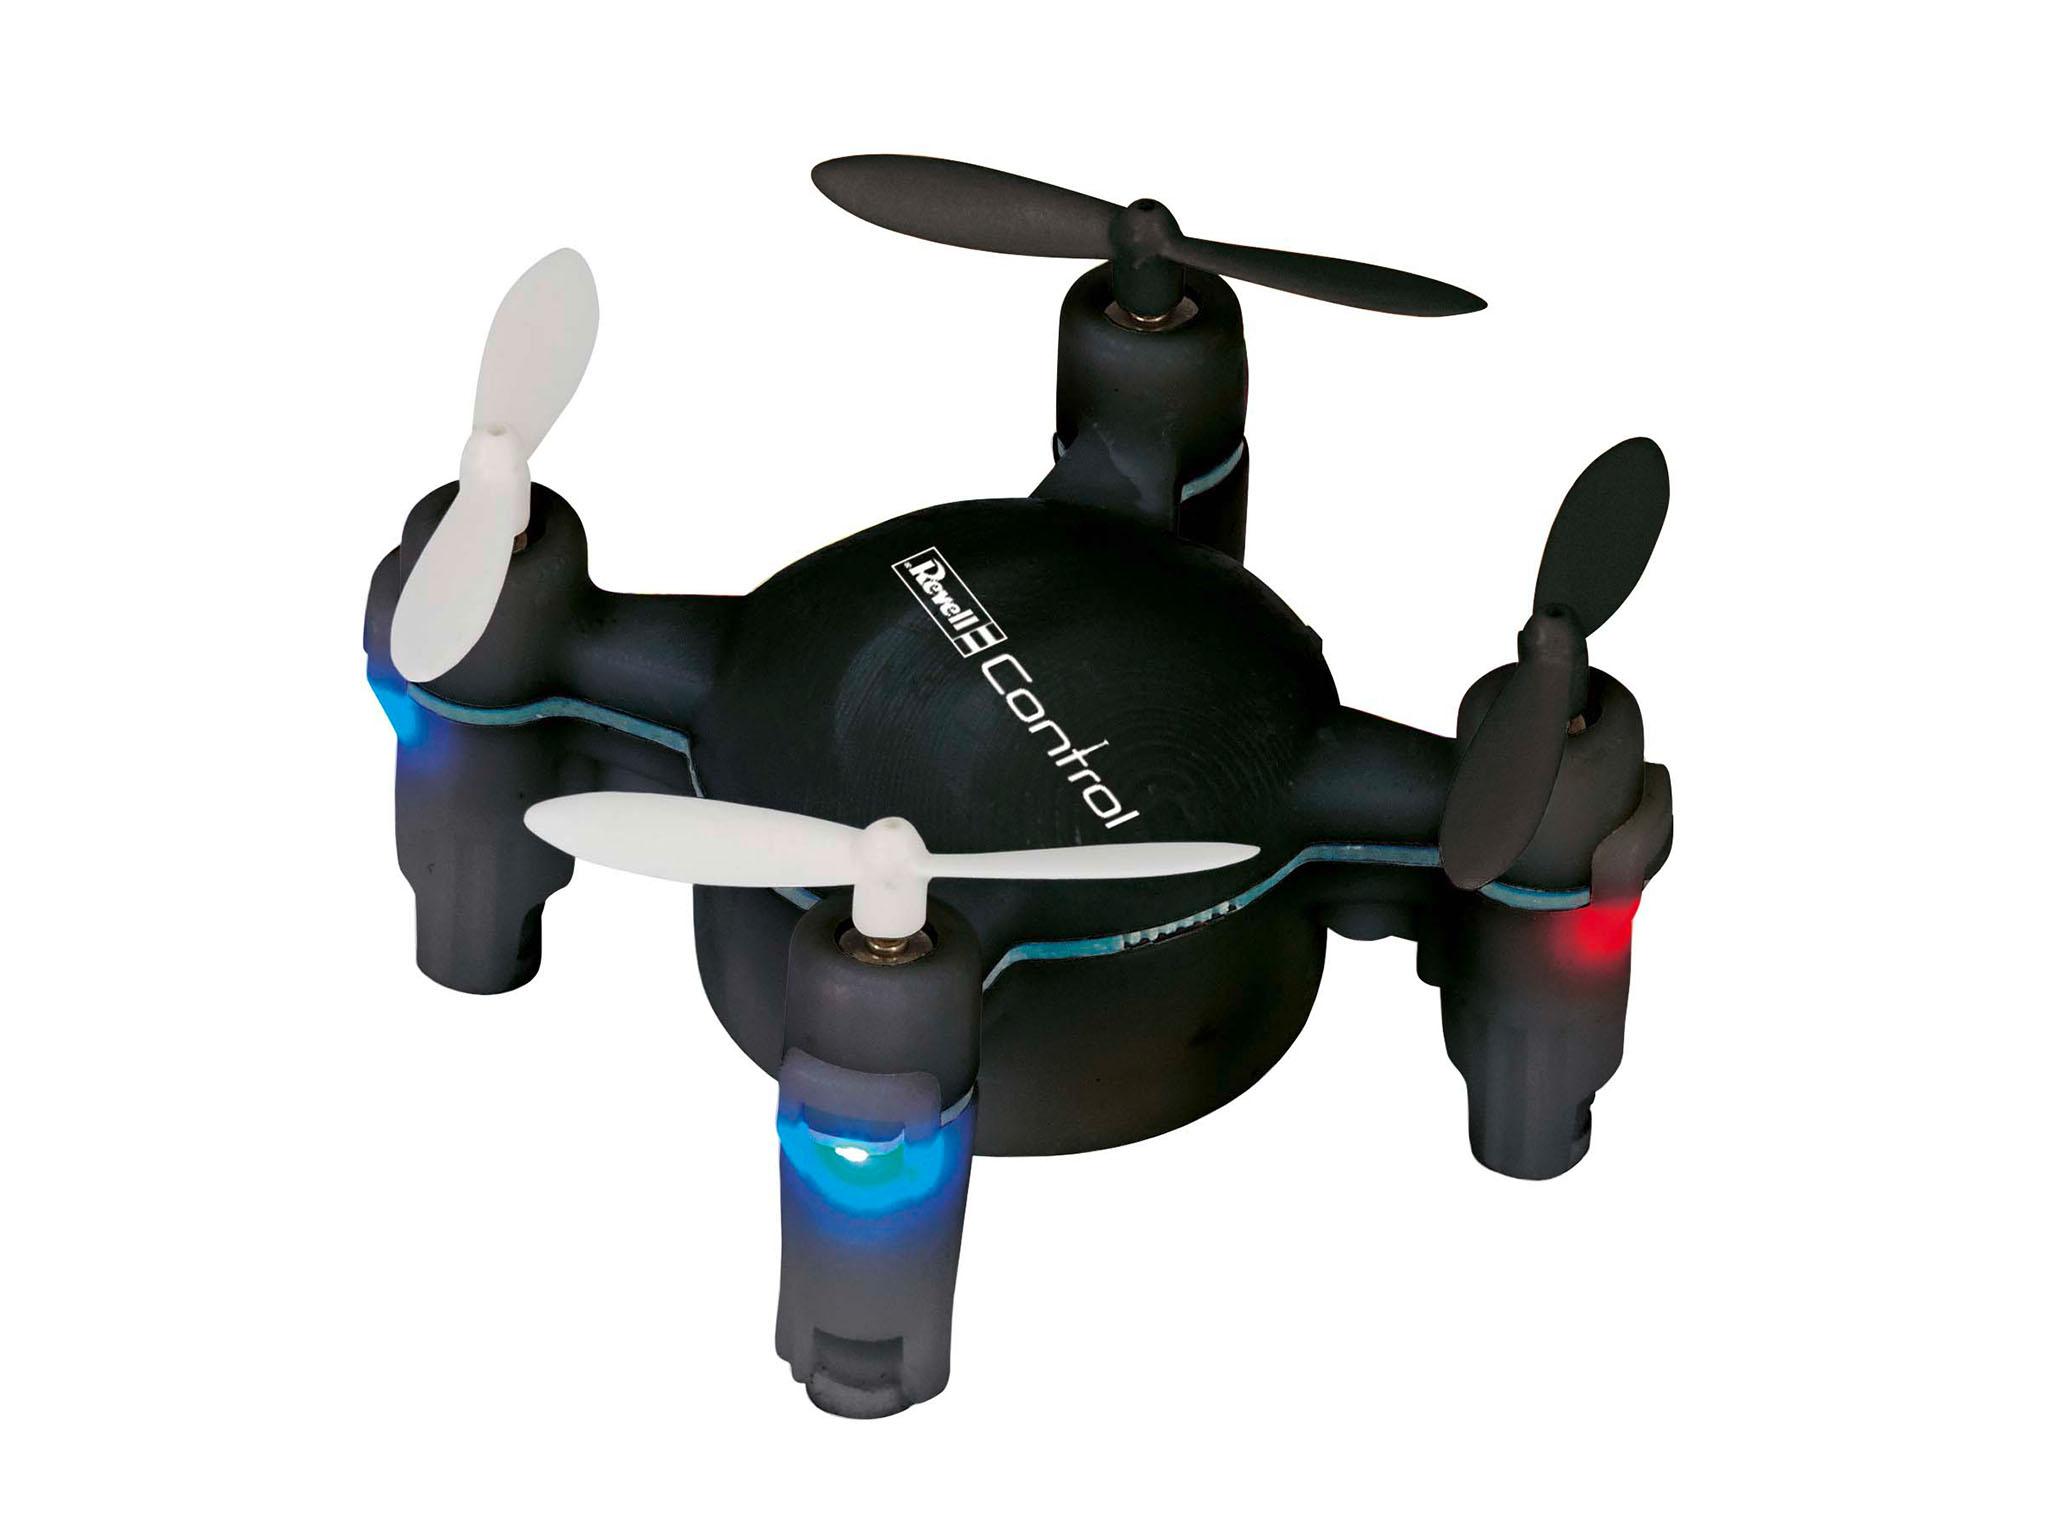 revell shop quadcopter nano quad fun black revell shop. Black Bedroom Furniture Sets. Home Design Ideas